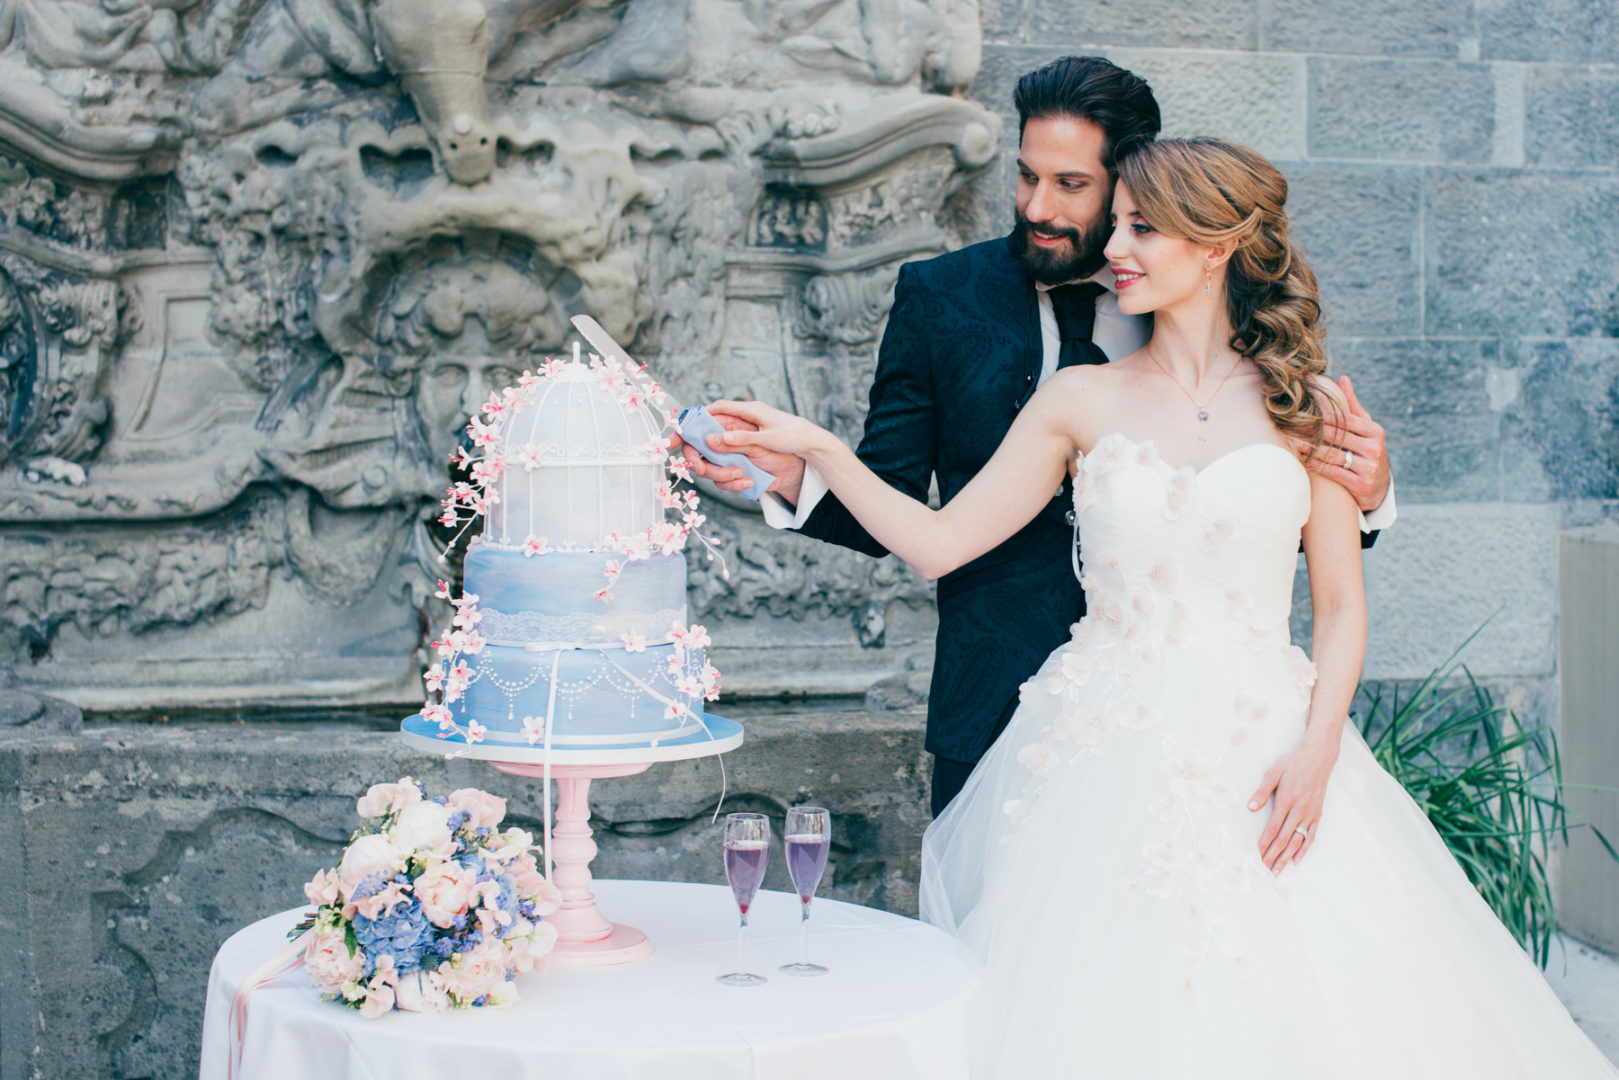 Für Web - Styled Shooting in Zürich, Photos by ITM MEDIA-Weddingcrashers.info-84